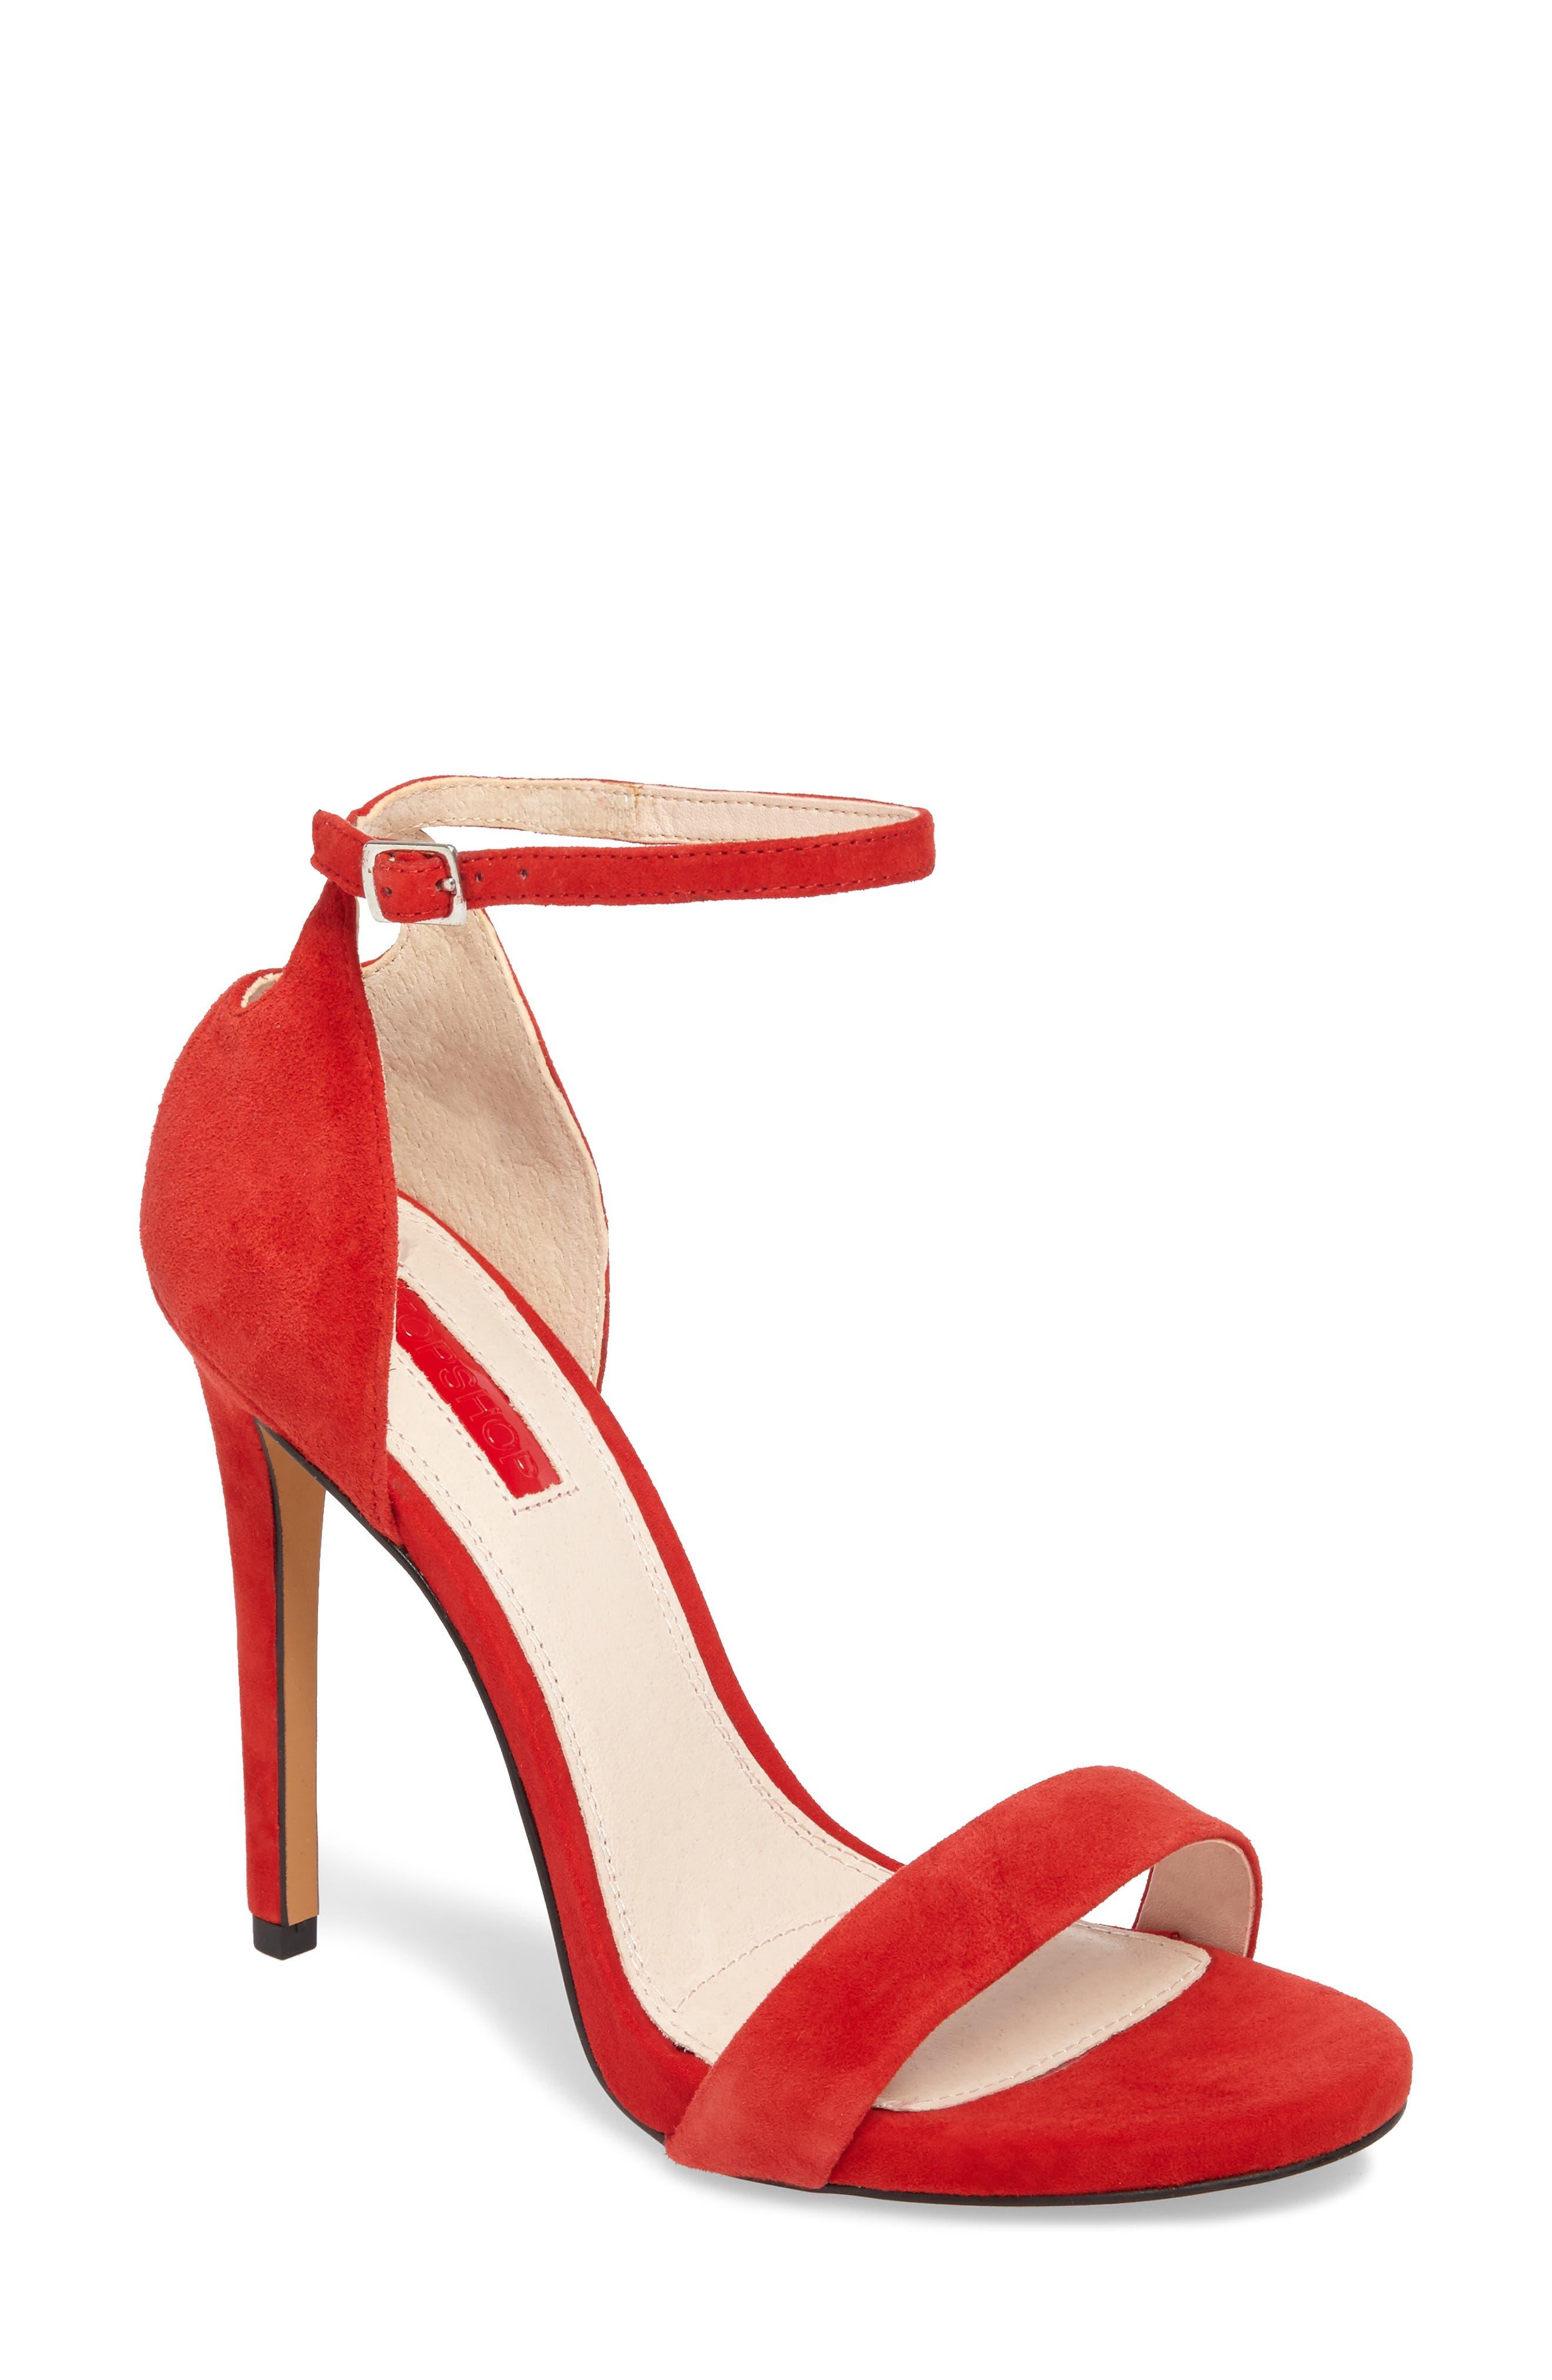 Main Image - Topshop Raphie Ankle Strap Sandal (Women)